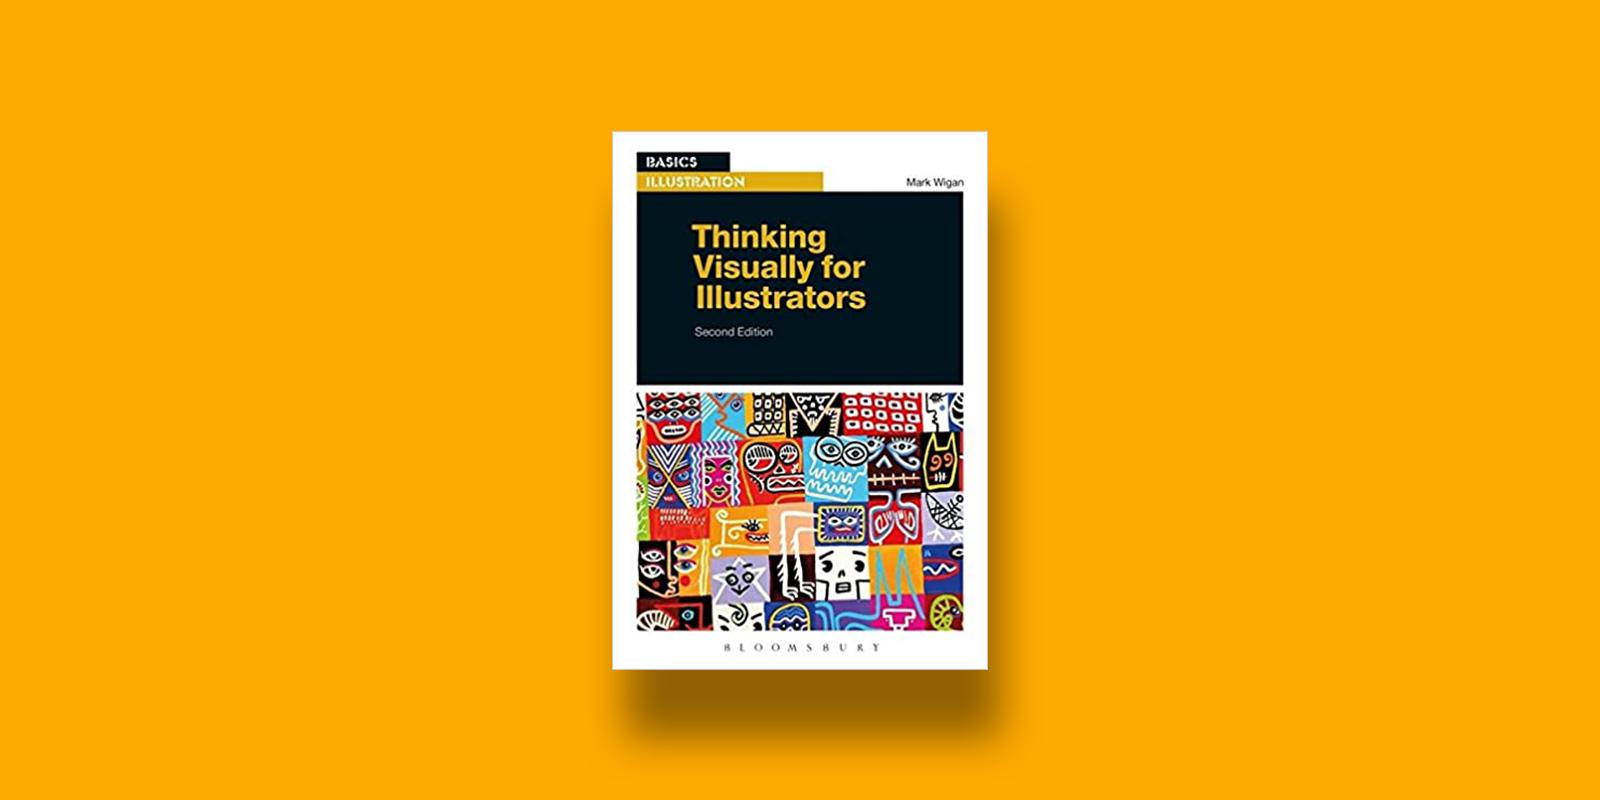 Thinking Visually for Illustrators Best Books